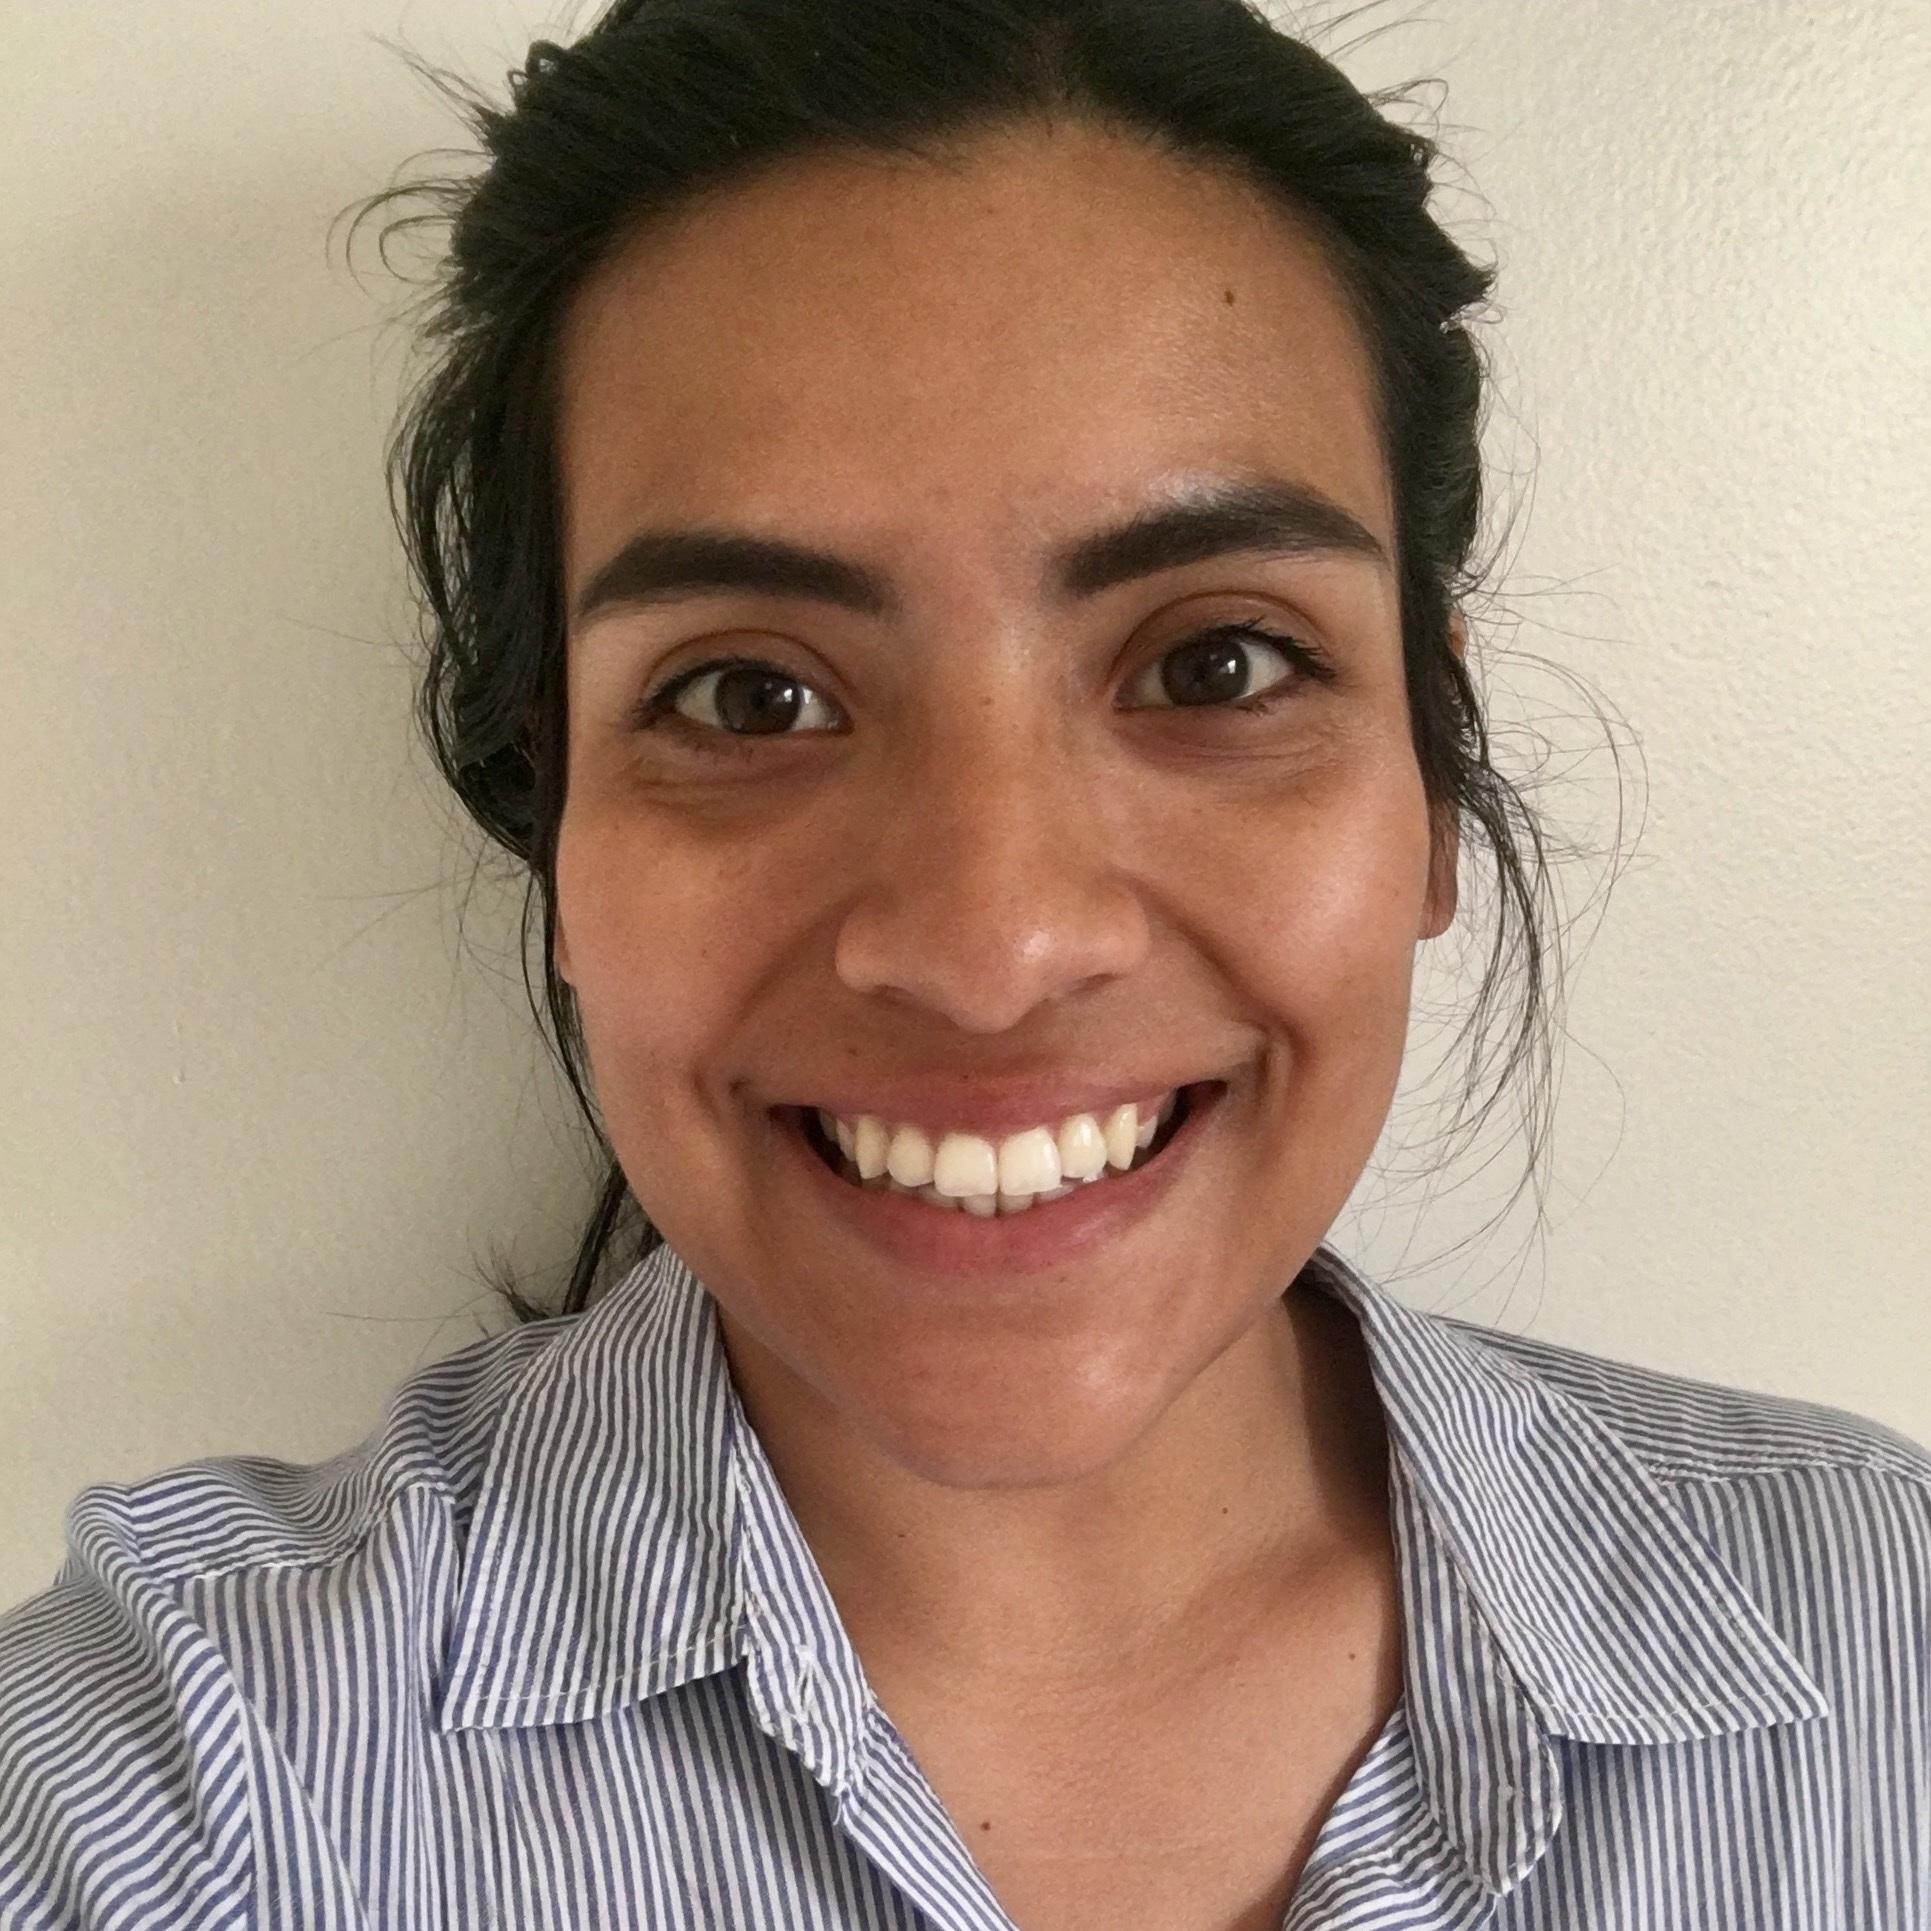 ROXANA (ROXIE) SIERRA   RESEARCH AND ADMINISTRATIVE INTERN